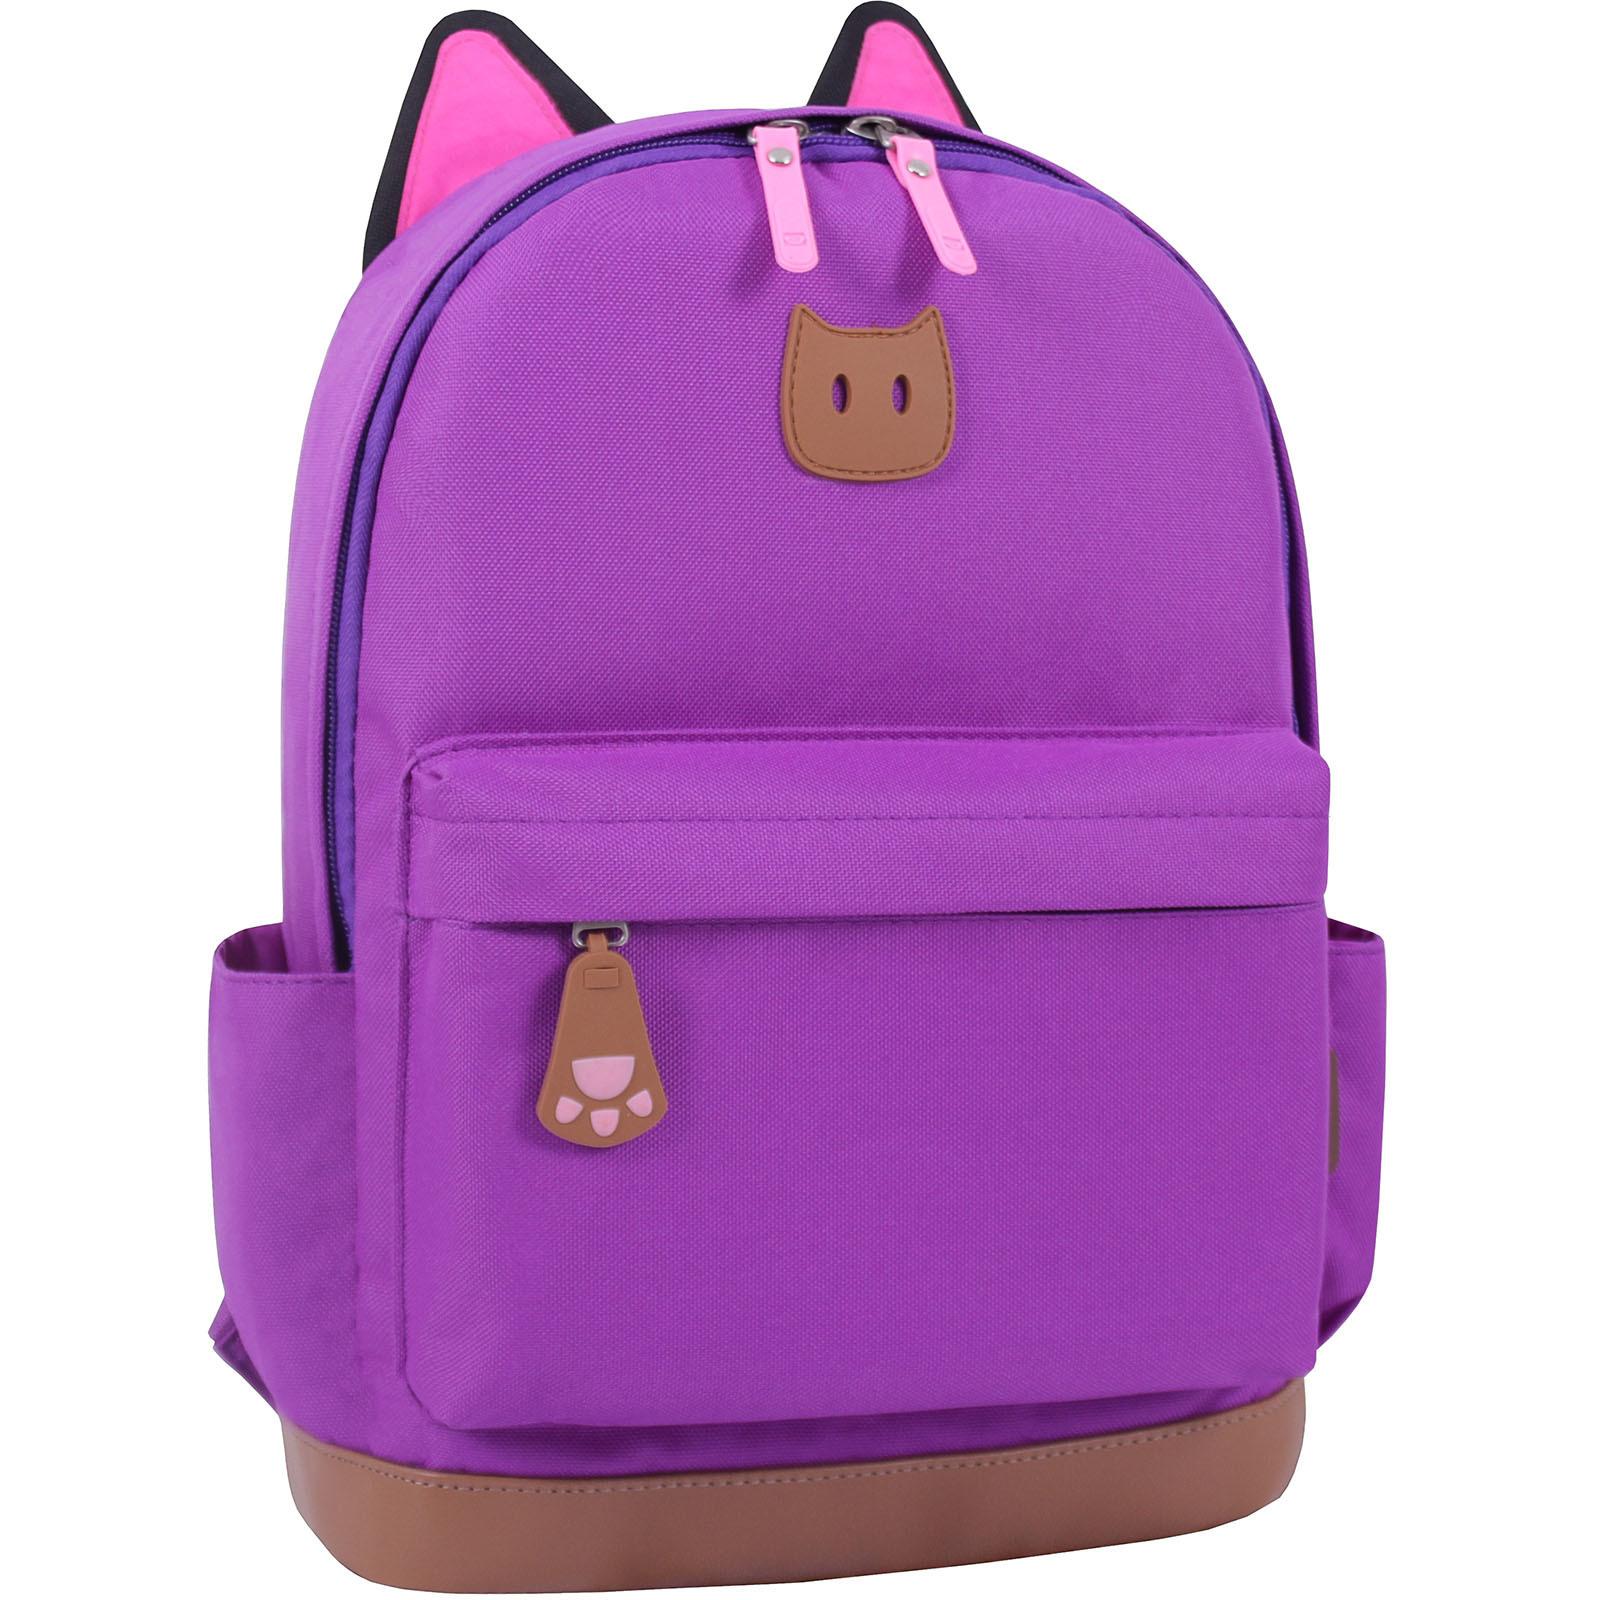 Женские рюкзаки Рюкзак Bagland Ears фиолетовый (0054566) IMG_0878.JPG